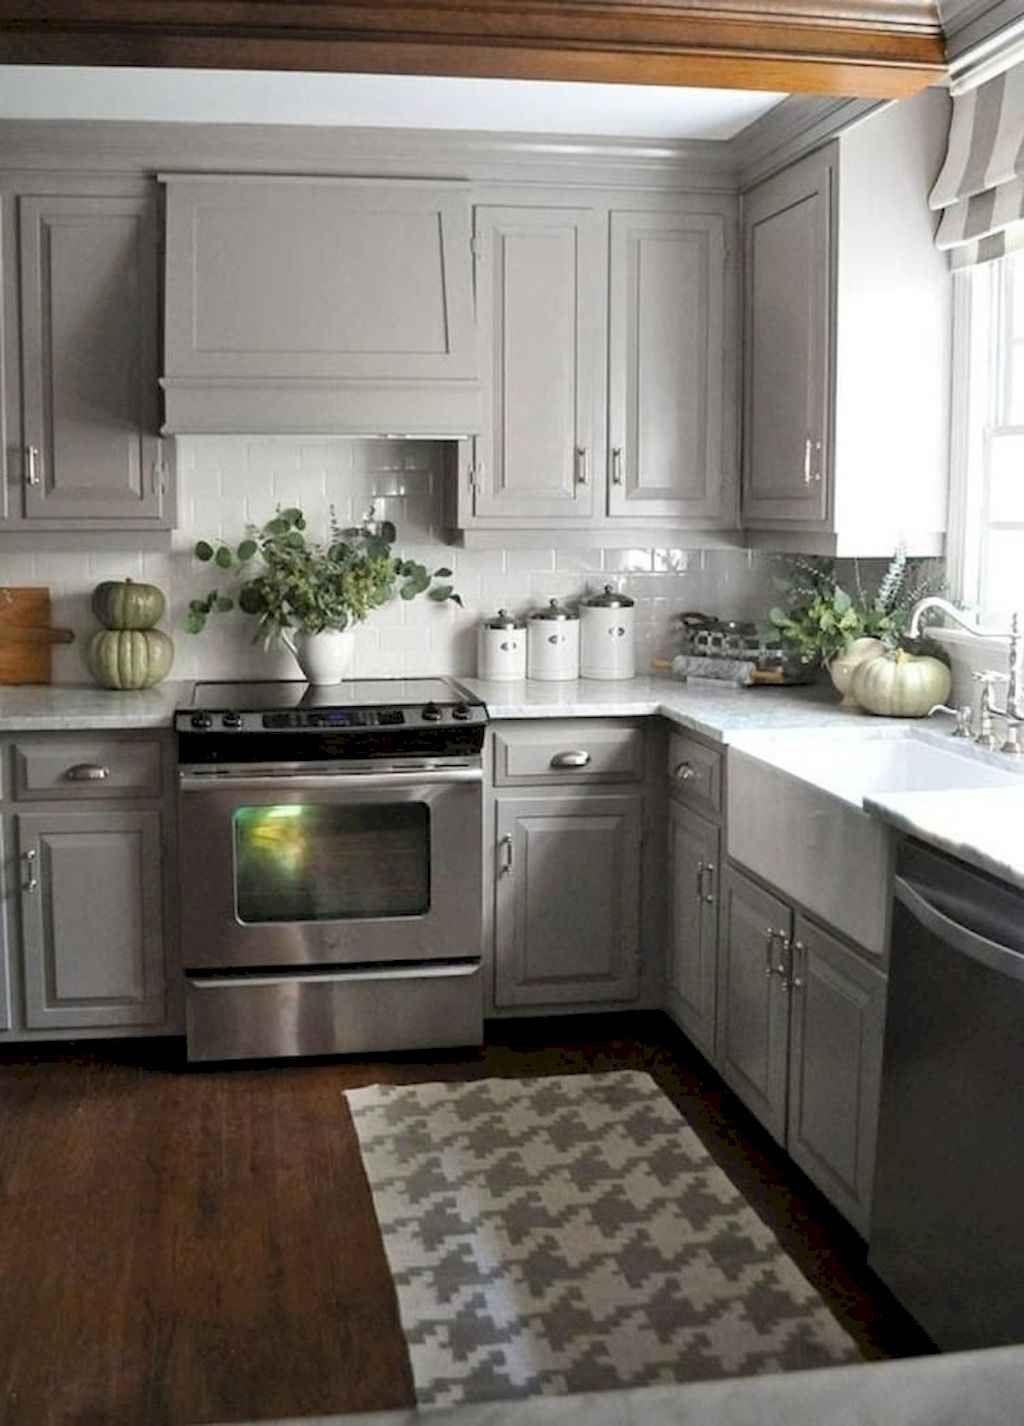 75 farmhouse gray kitchen cabinet design ideas kitchen renovation diy kitchen renovation on kitchen ideas gray id=51245